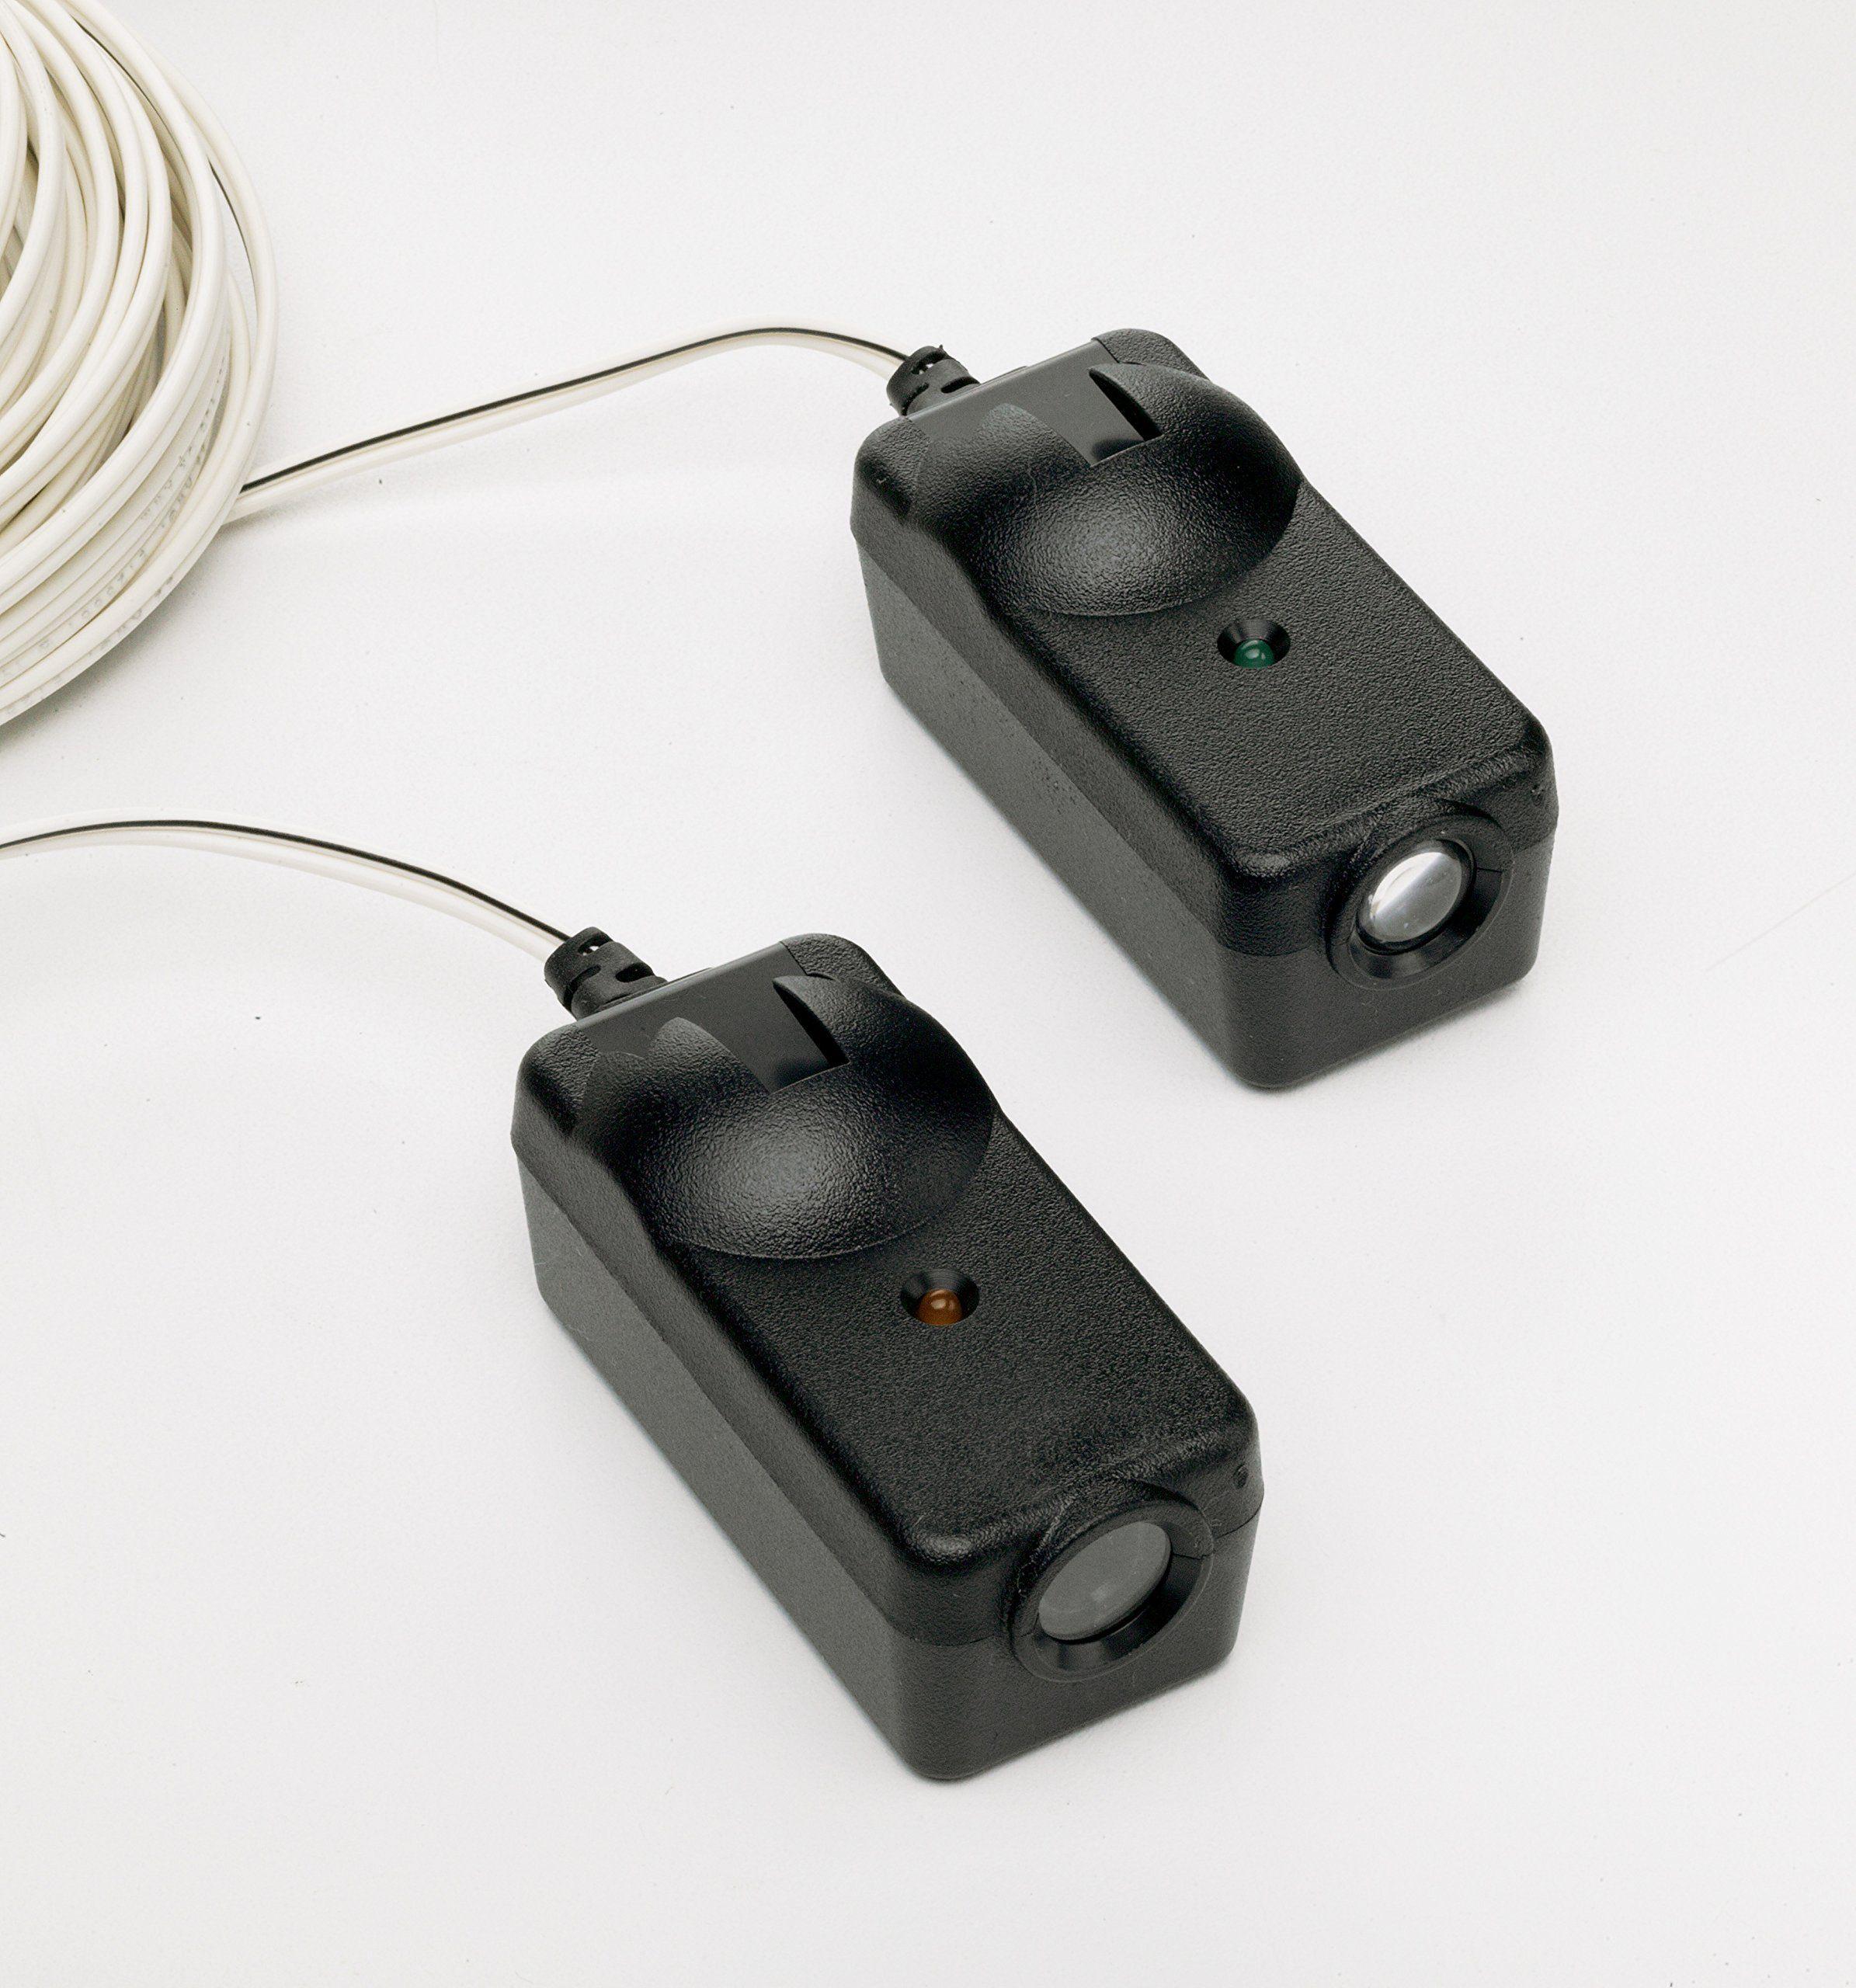 Chamberlain Liftmaster Craftsman Garage Door Opener Replacement Safety Sensors G8 With Images Chamberlain